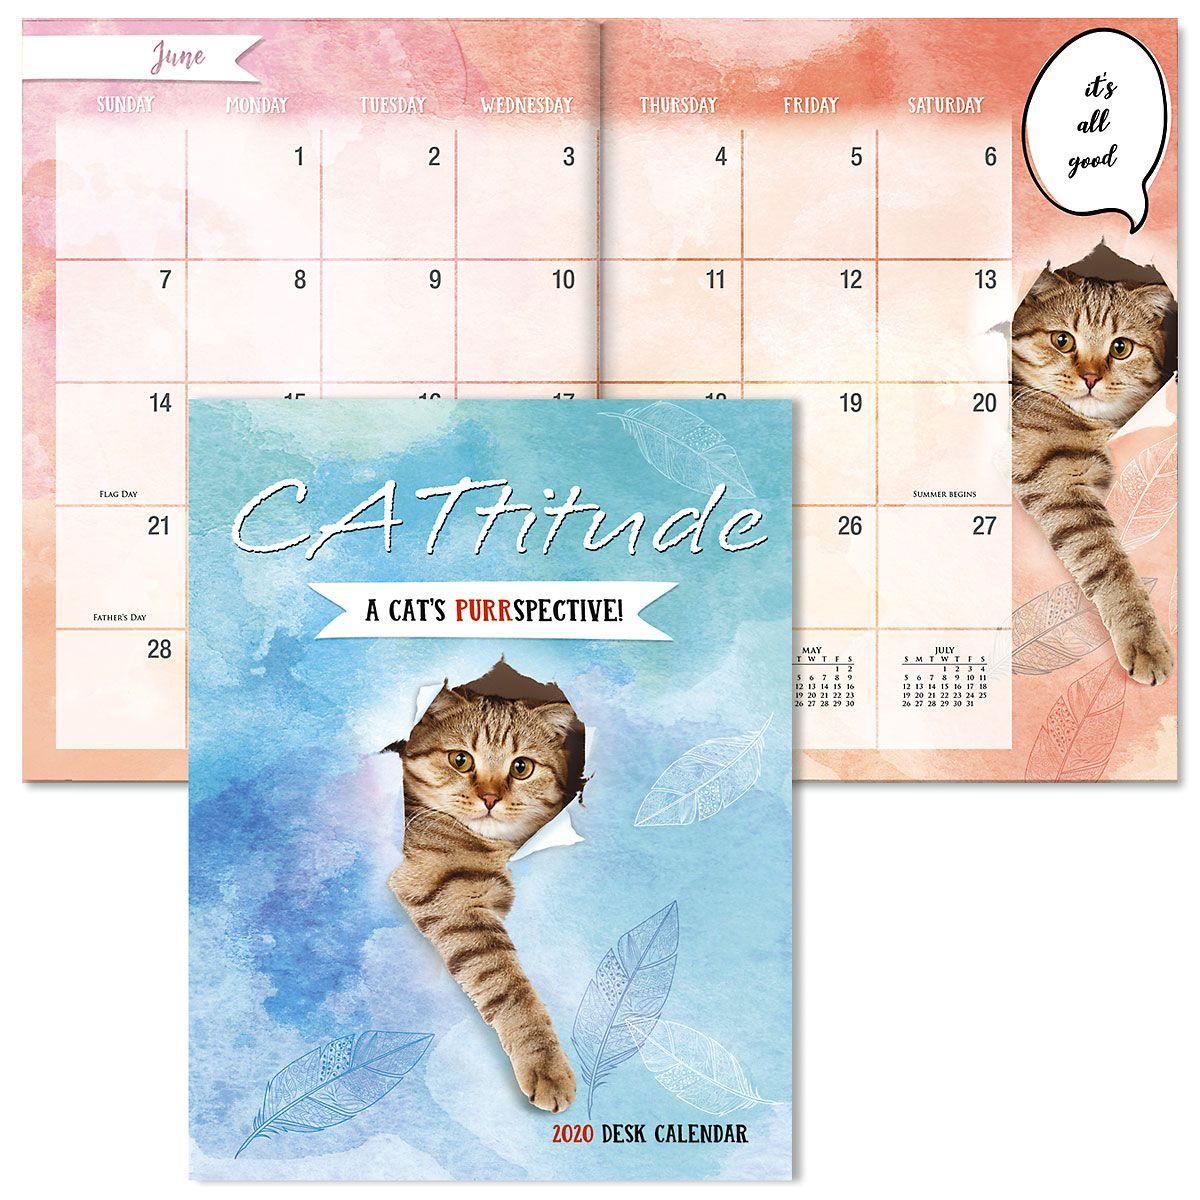 2020 CATtitudes Desk Calendar